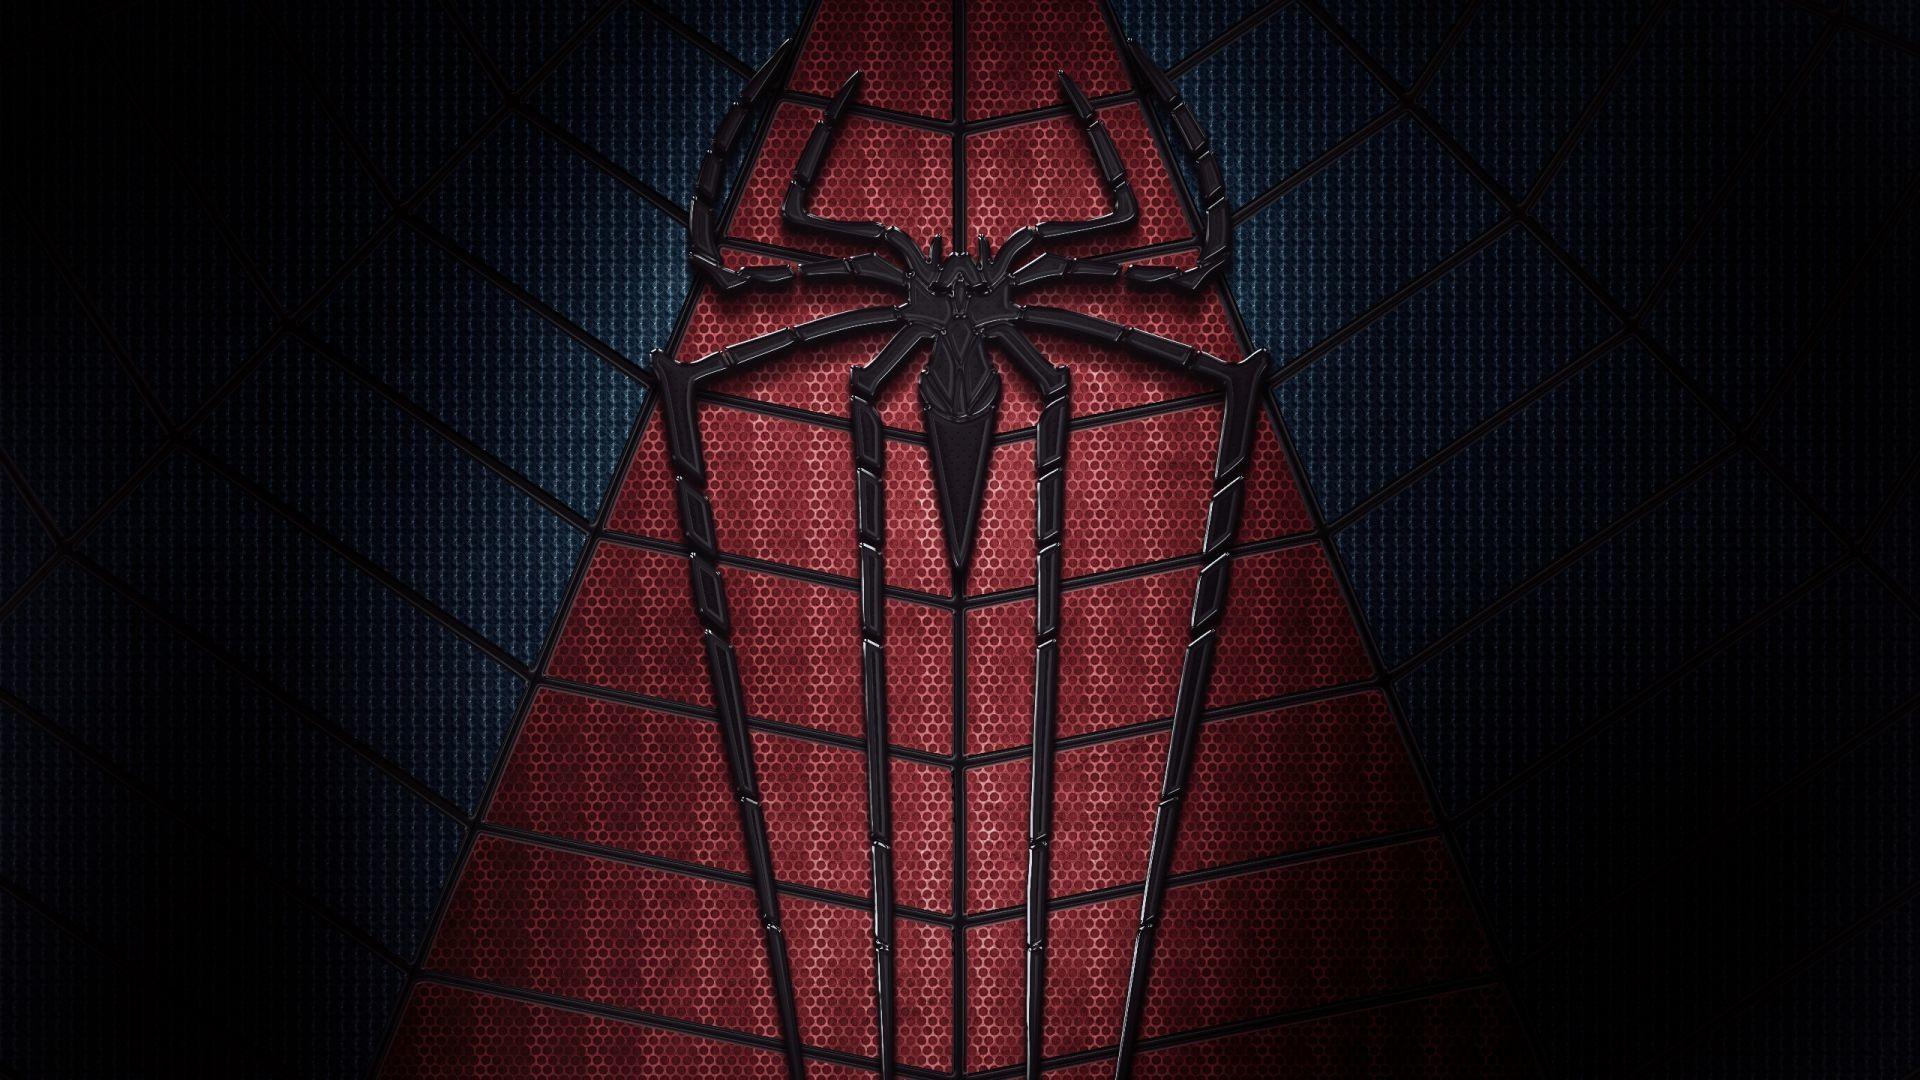 Download HD Wallpaper the amazing spider man comics suit .